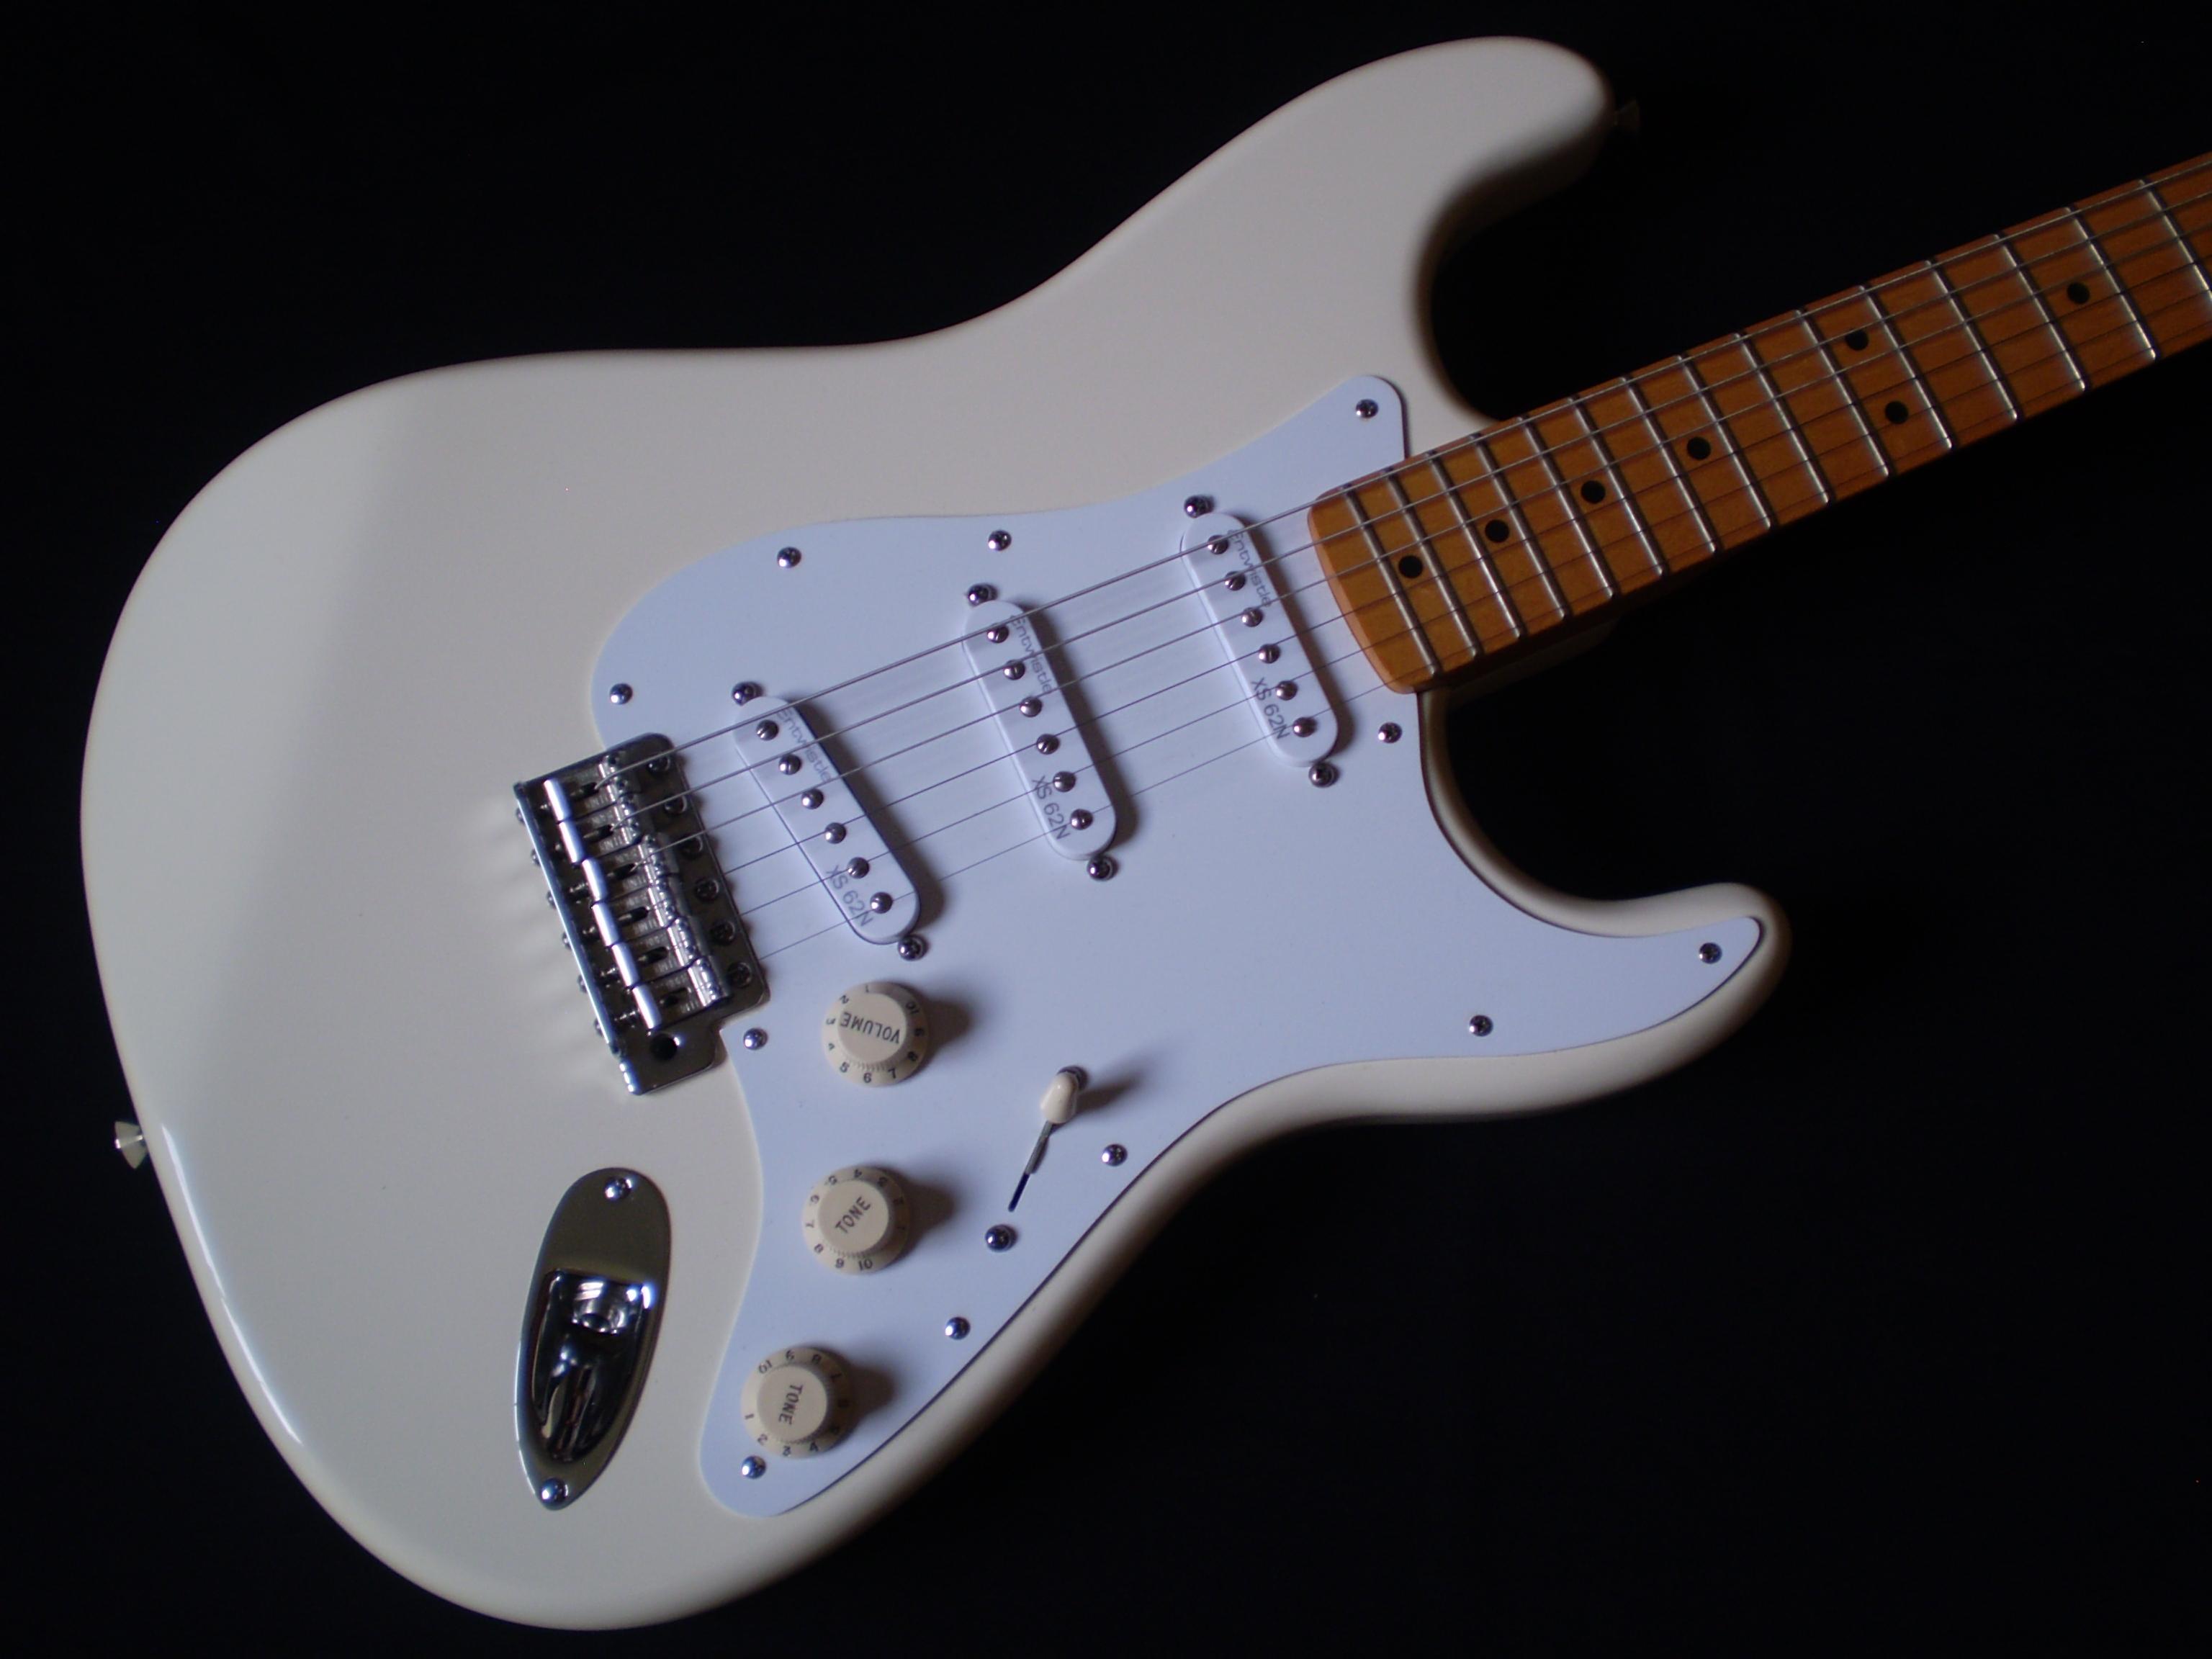 fender jimi hendrix stratocaster 2006 olympic white guitar for sale glenns guitars. Black Bedroom Furniture Sets. Home Design Ideas